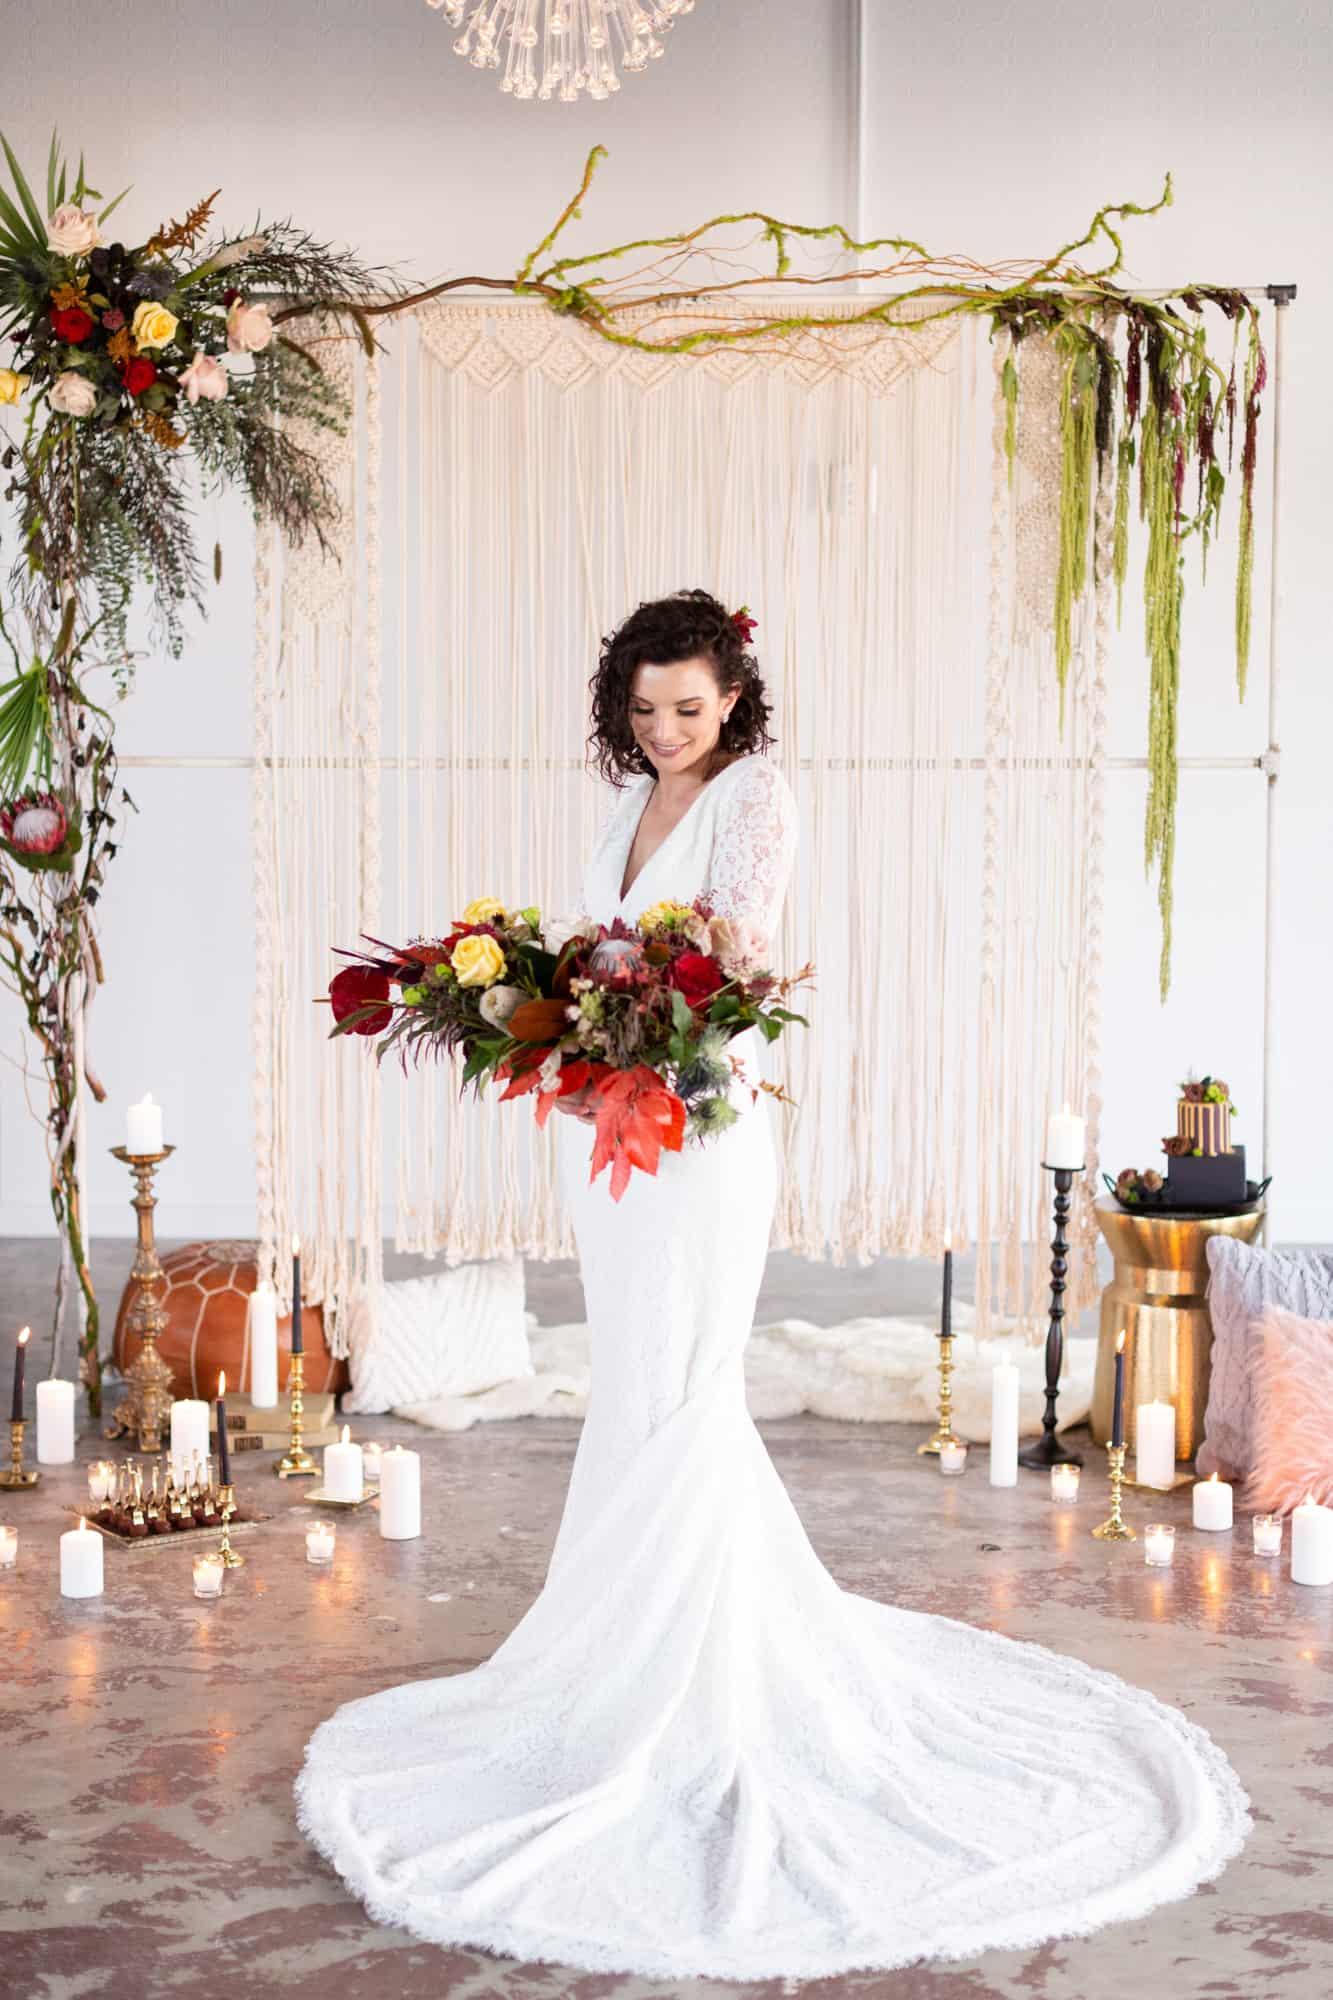 a-savvy-bridal-wedding-dress-on-a-stunning-bride-at-the-havana-room